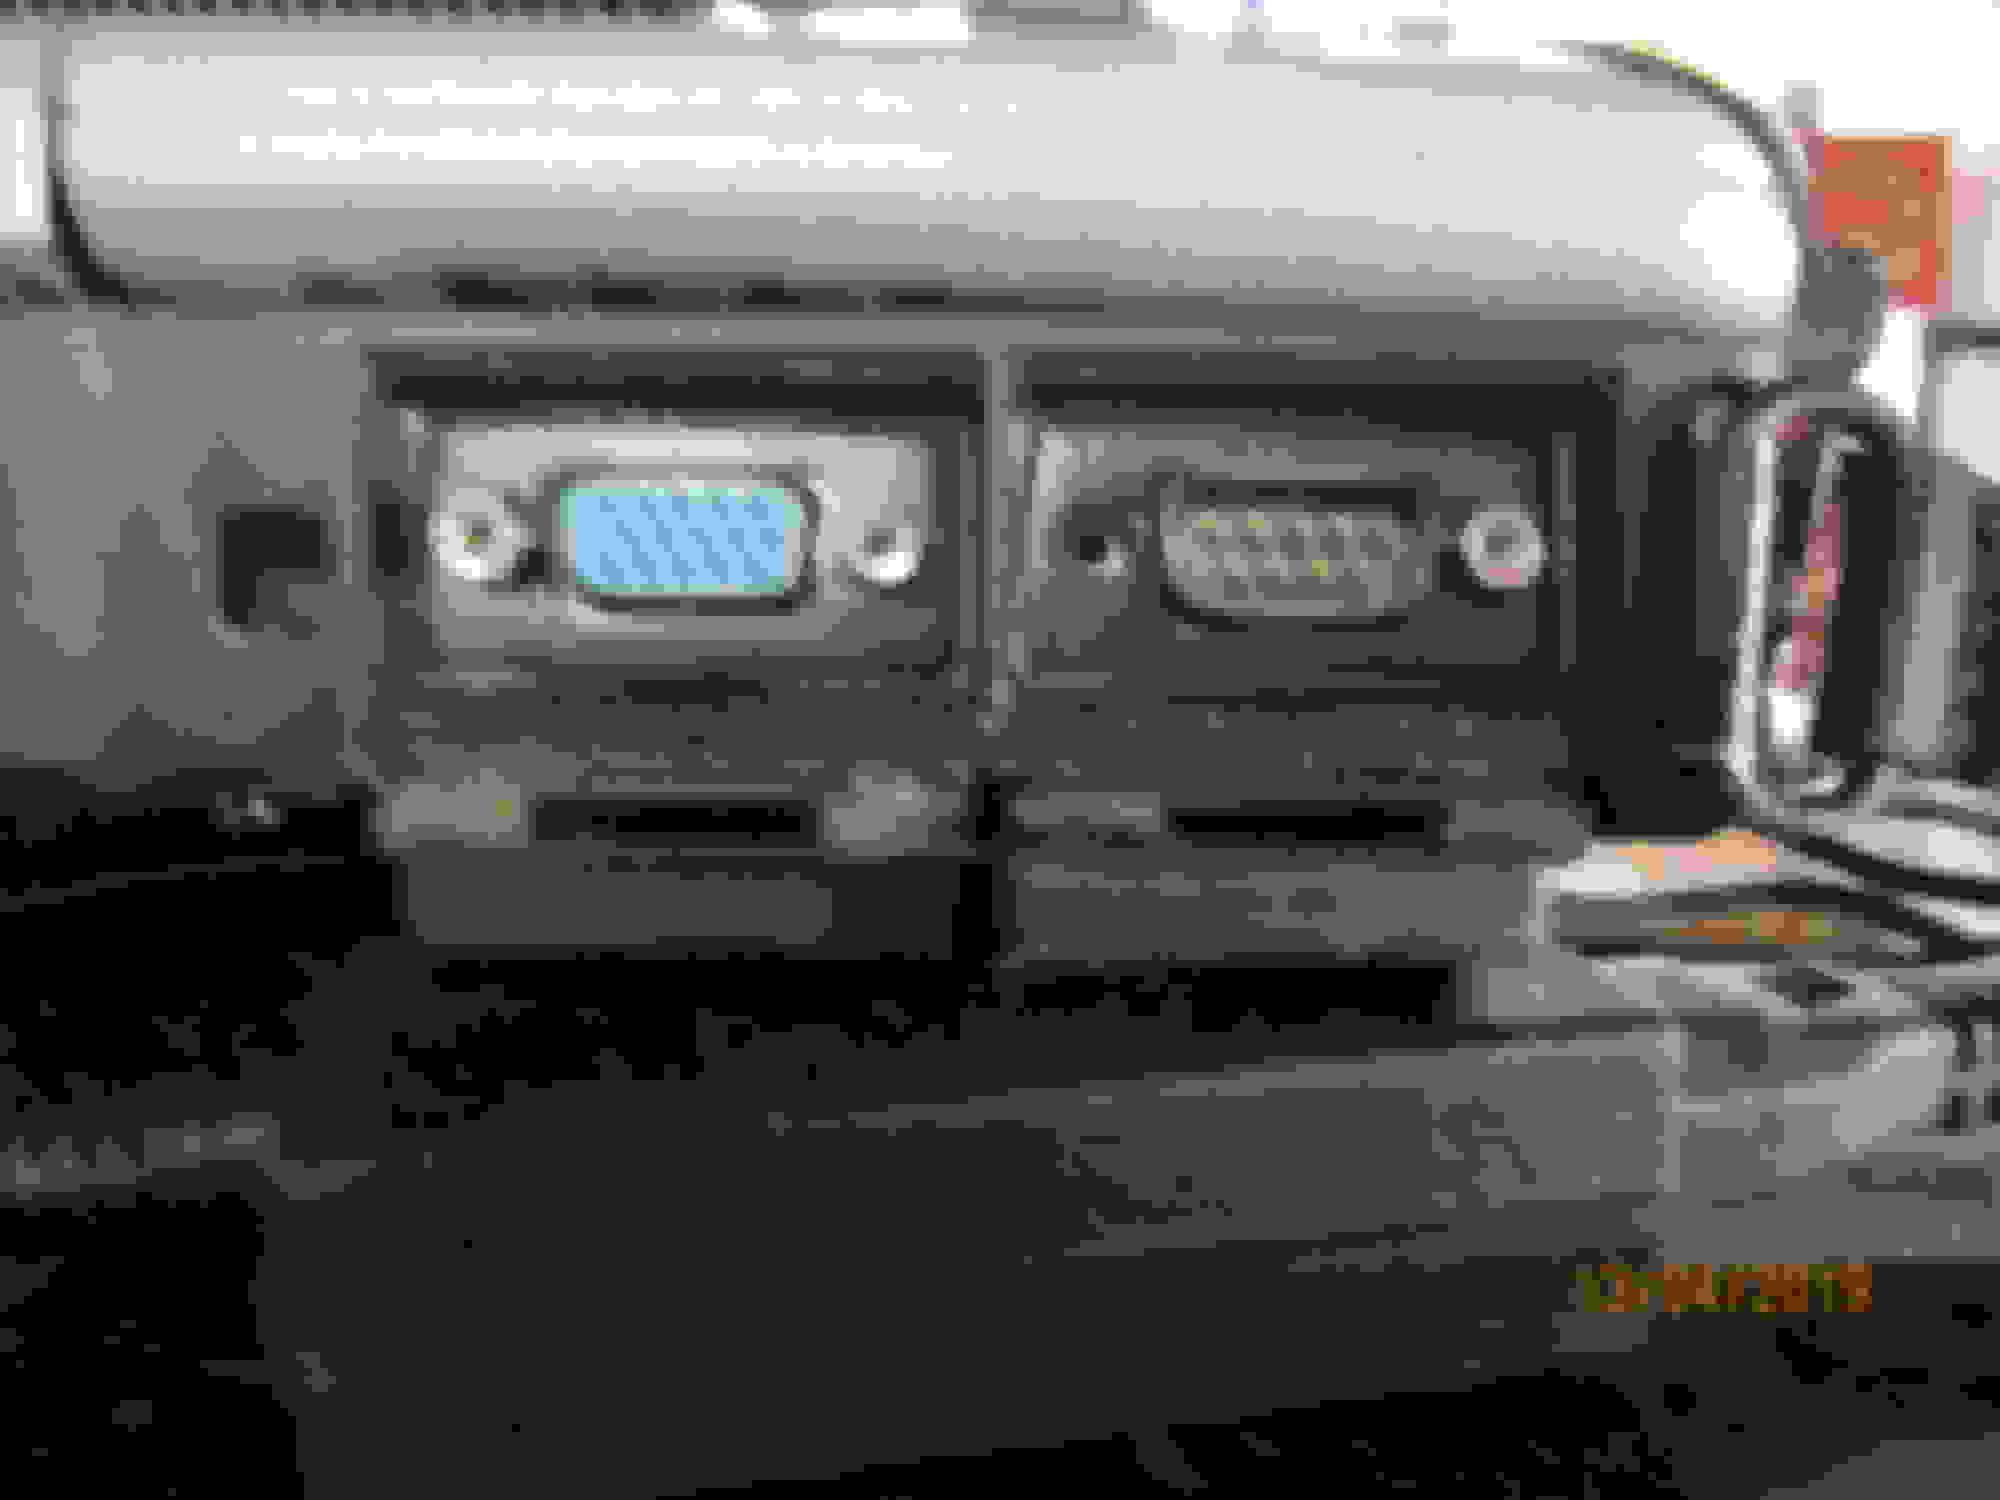 Piggyback ECU for turbo charged 1997 X300 - Page 2 - Jaguar